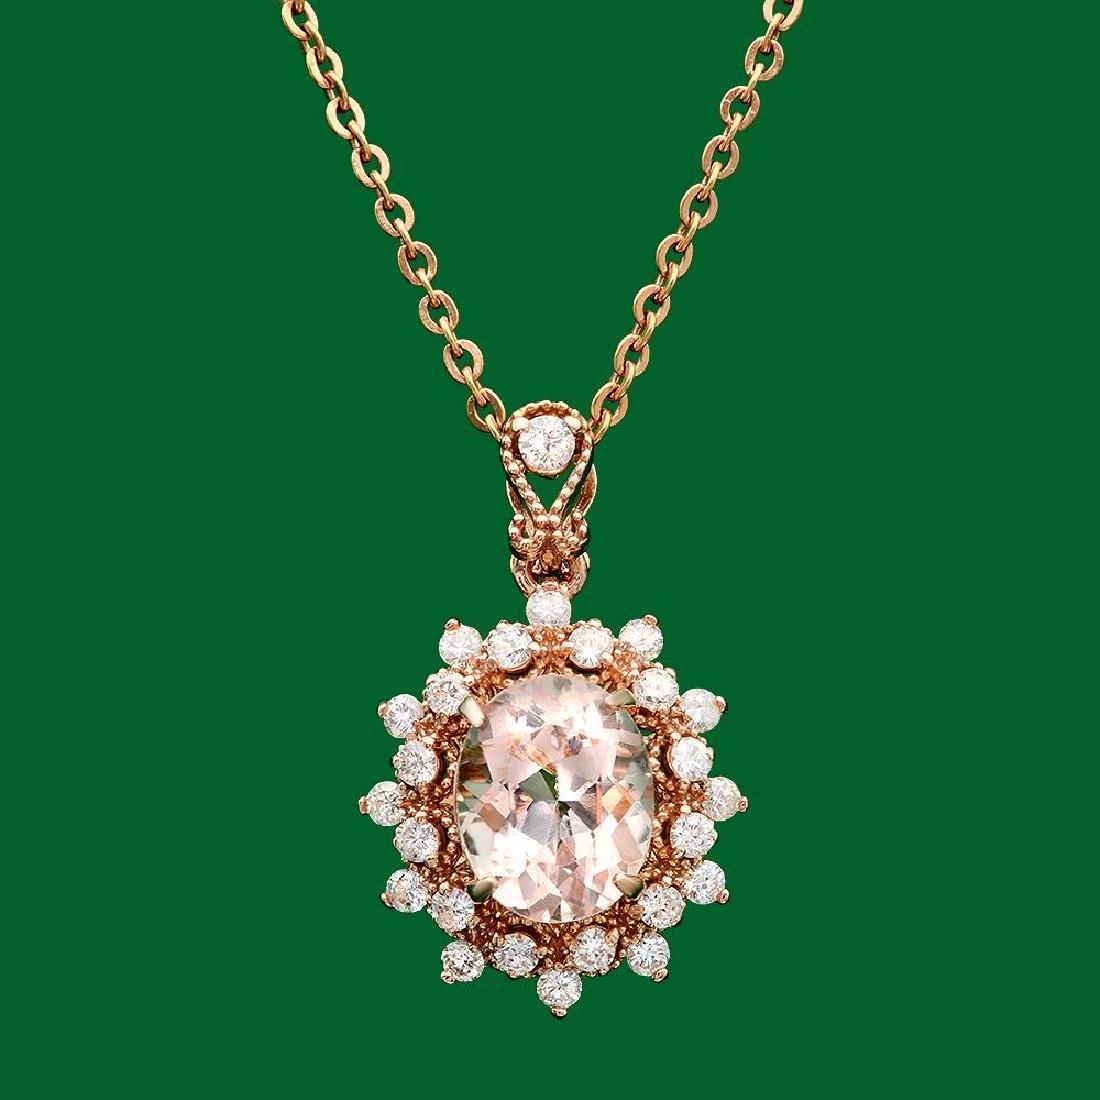 14k Gold 2.67ct Morganite 0.70ct Diamond Pendant